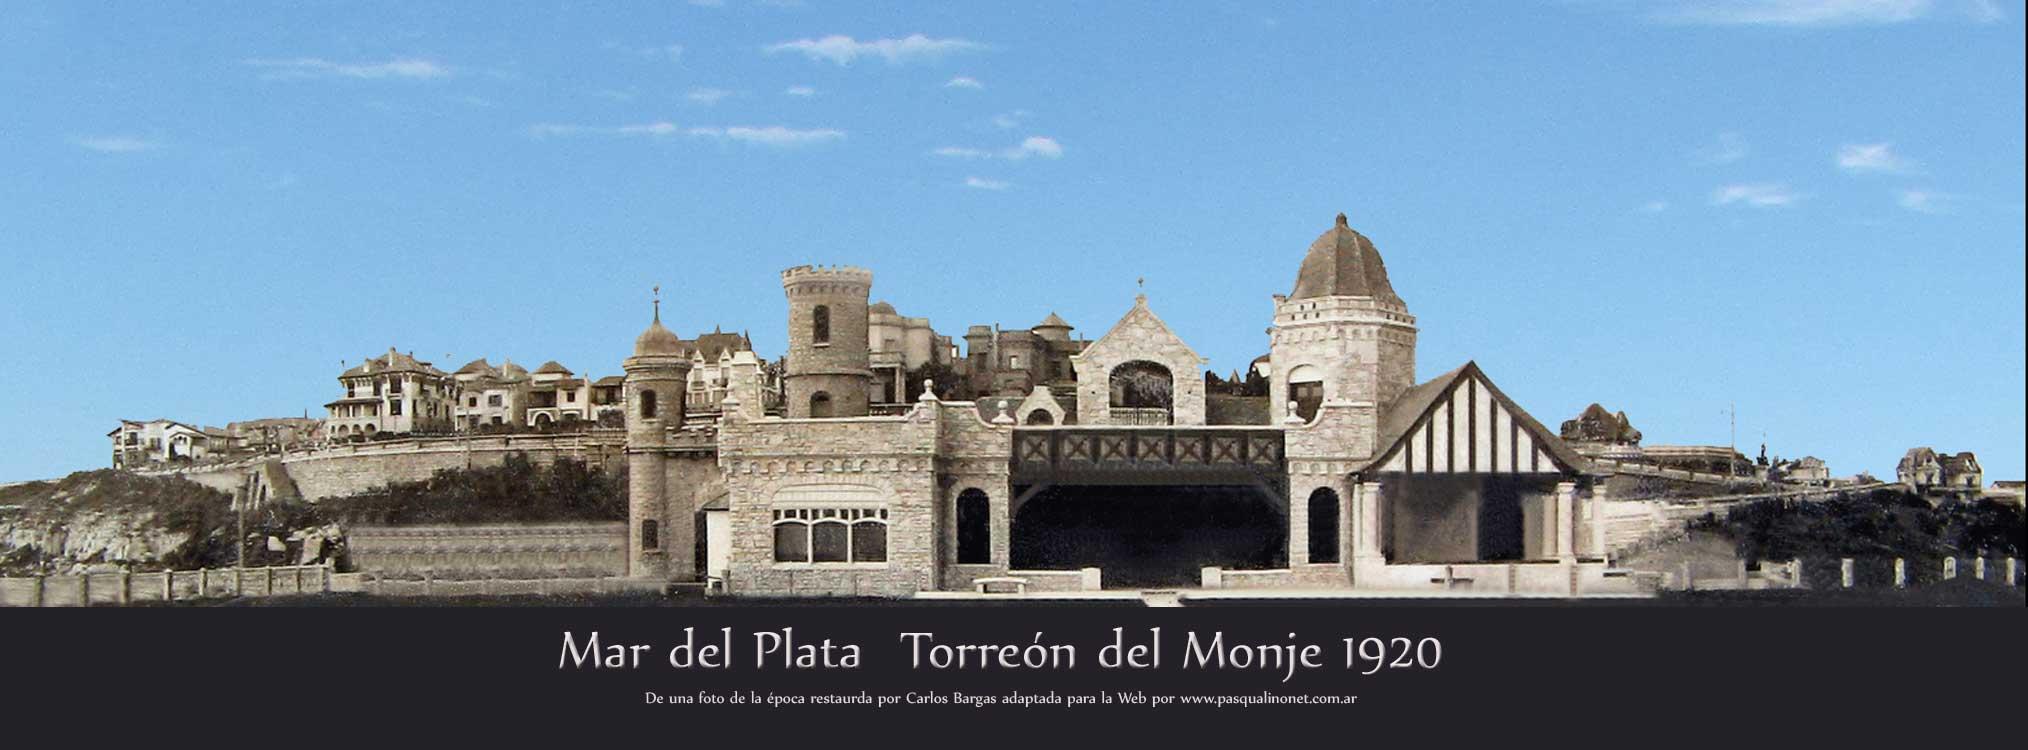 La leyenda del Torreón del Monje (Mar del Plata)